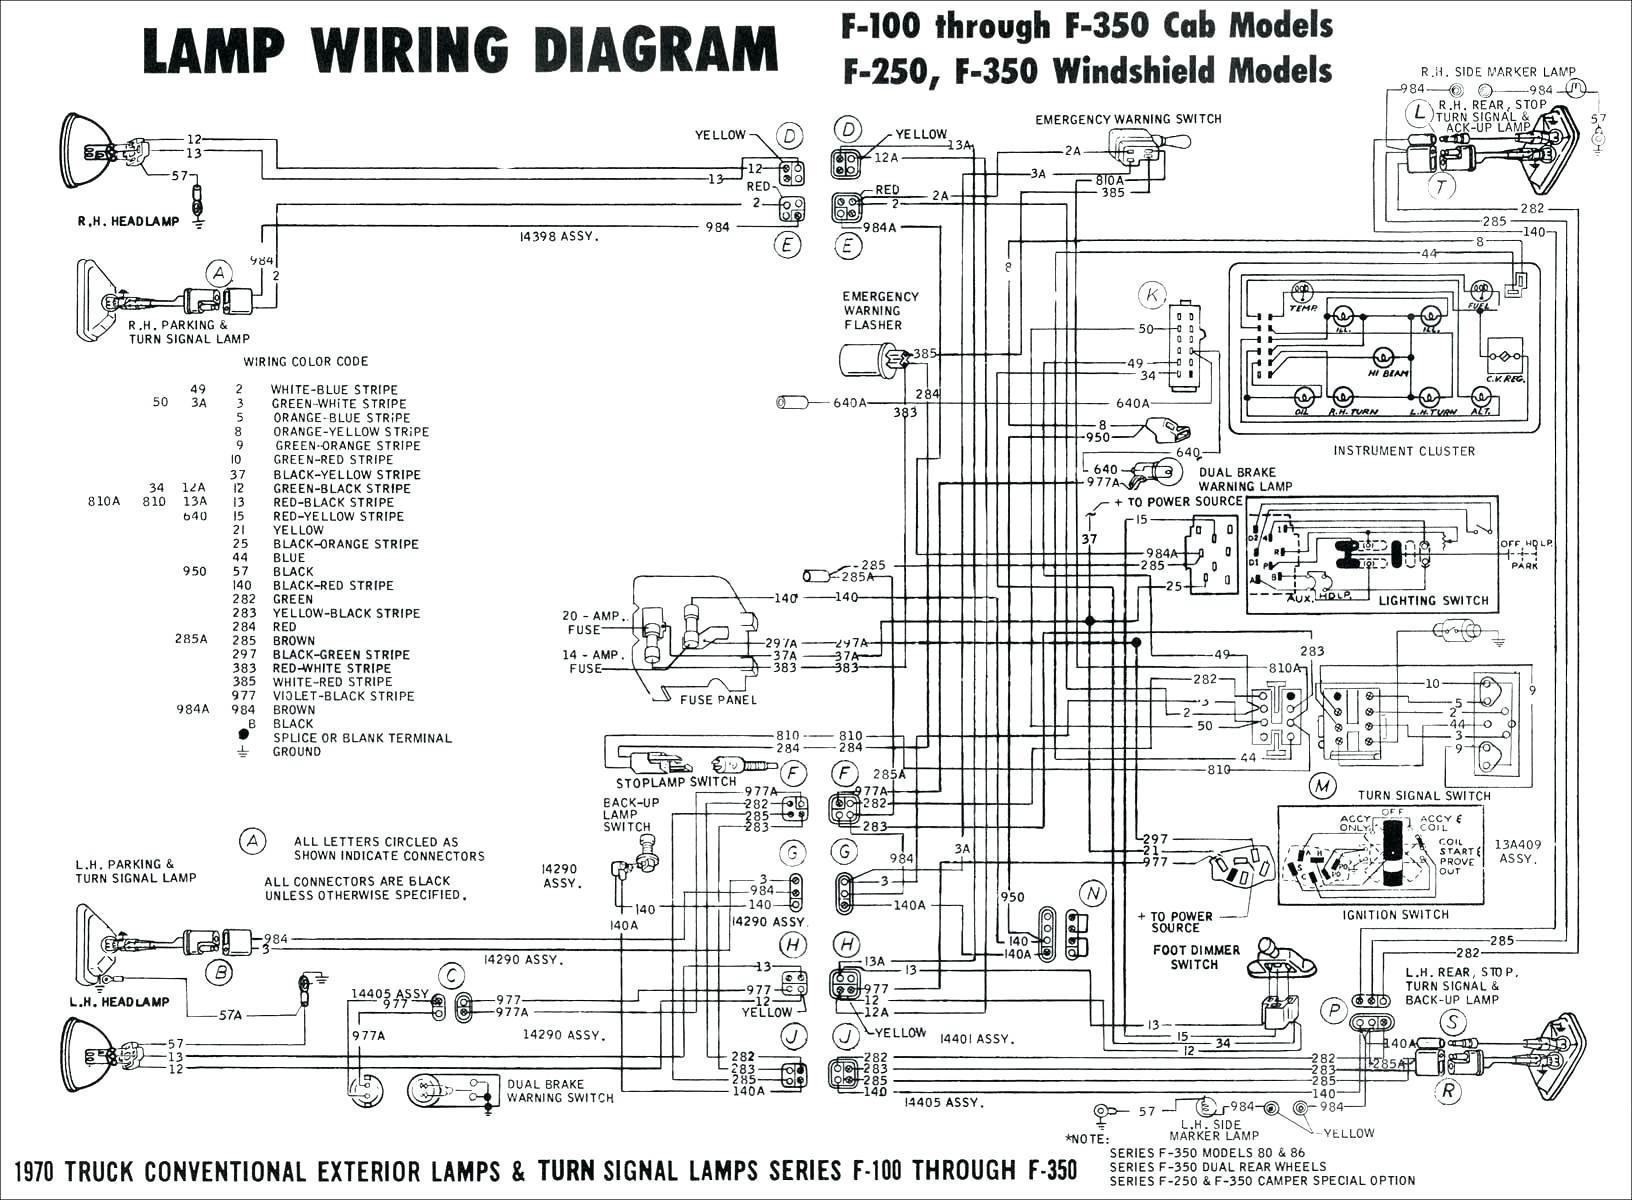 2000 Honda Accord Parts Diagram 1997 Accord Fuse Diagram Layout Wiring Diagrams • Of 2000 Honda Accord Parts Diagram